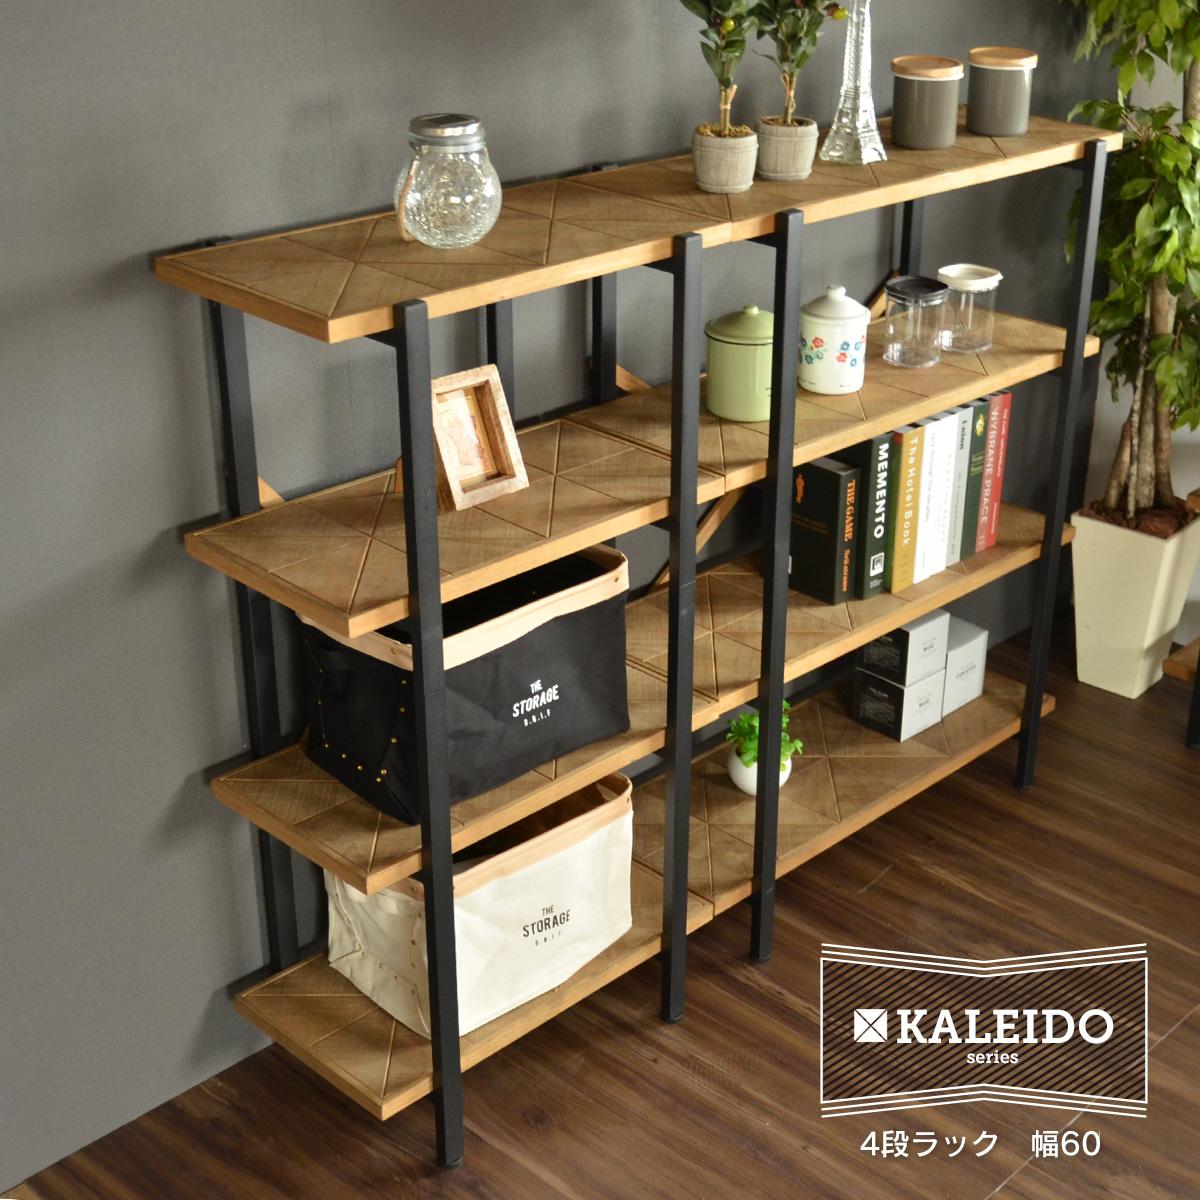 KALEIDO カレイド 4段ラック 幅60 オープン 収納 木製 棚 本棚 シェルフ 間仕切り ディスプレイ コンパクト スリム 省スペース 一人暮らし リビング おしゃれ デザインビンテージ